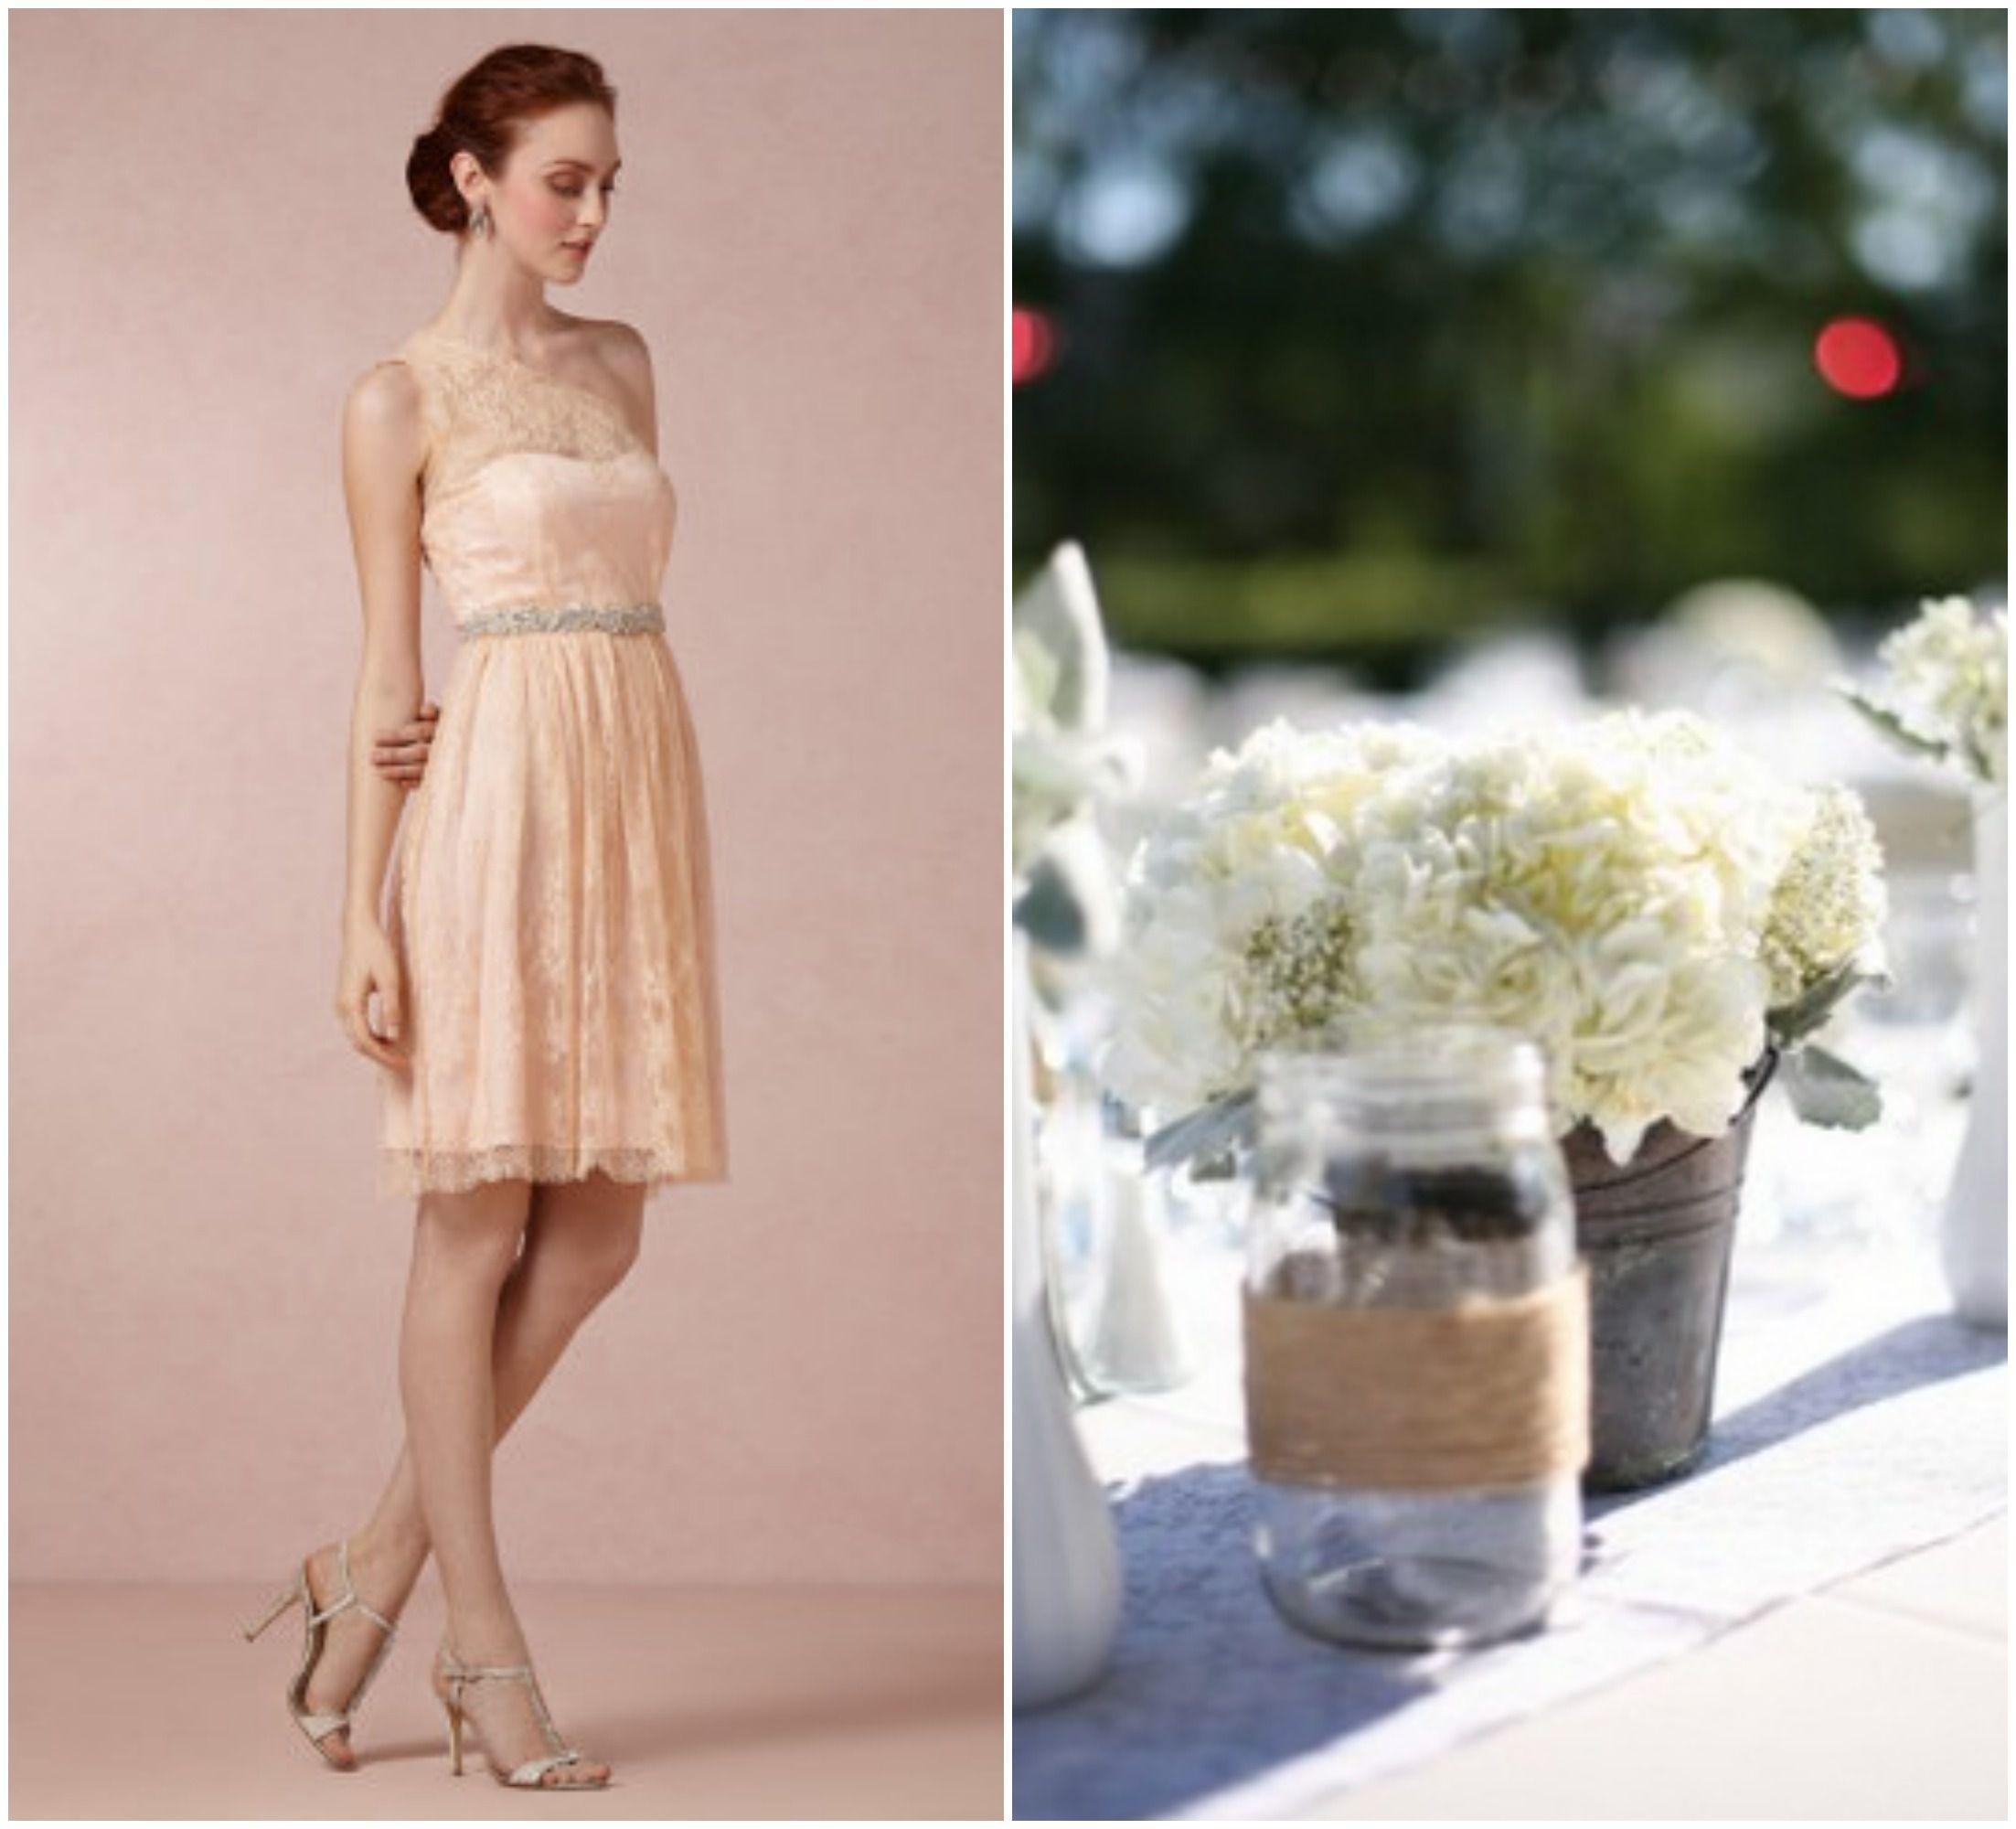 Garden Wedding Bridesmaid Dresses Rustic Wedding Chic